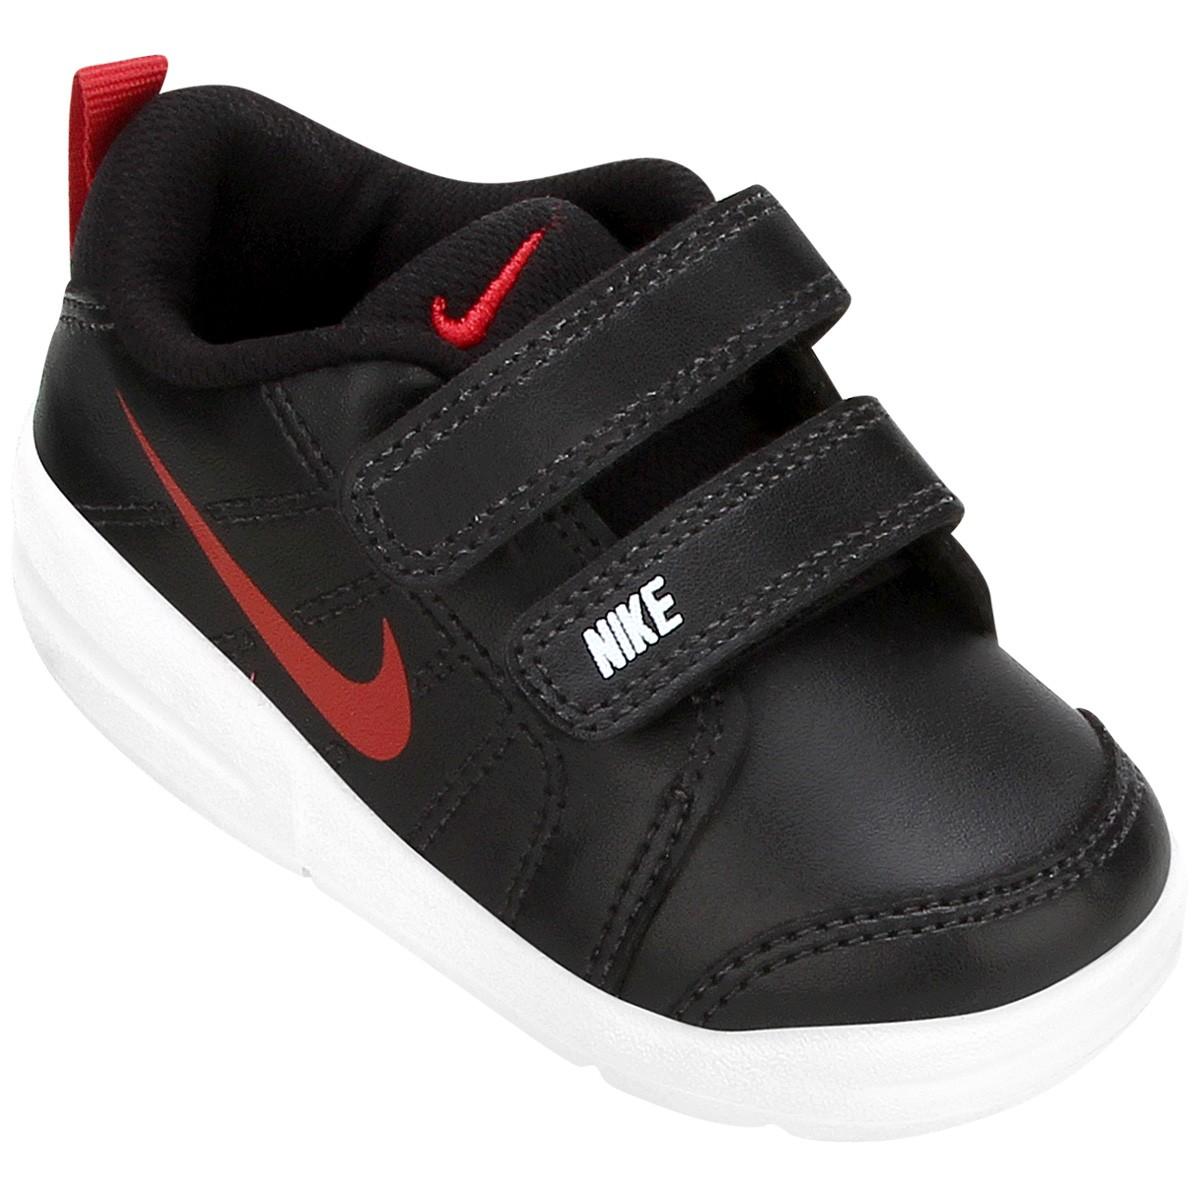 9040d1d3d9c Bizz Store - Tênis Infantil Menino Nike Pico LT Preto